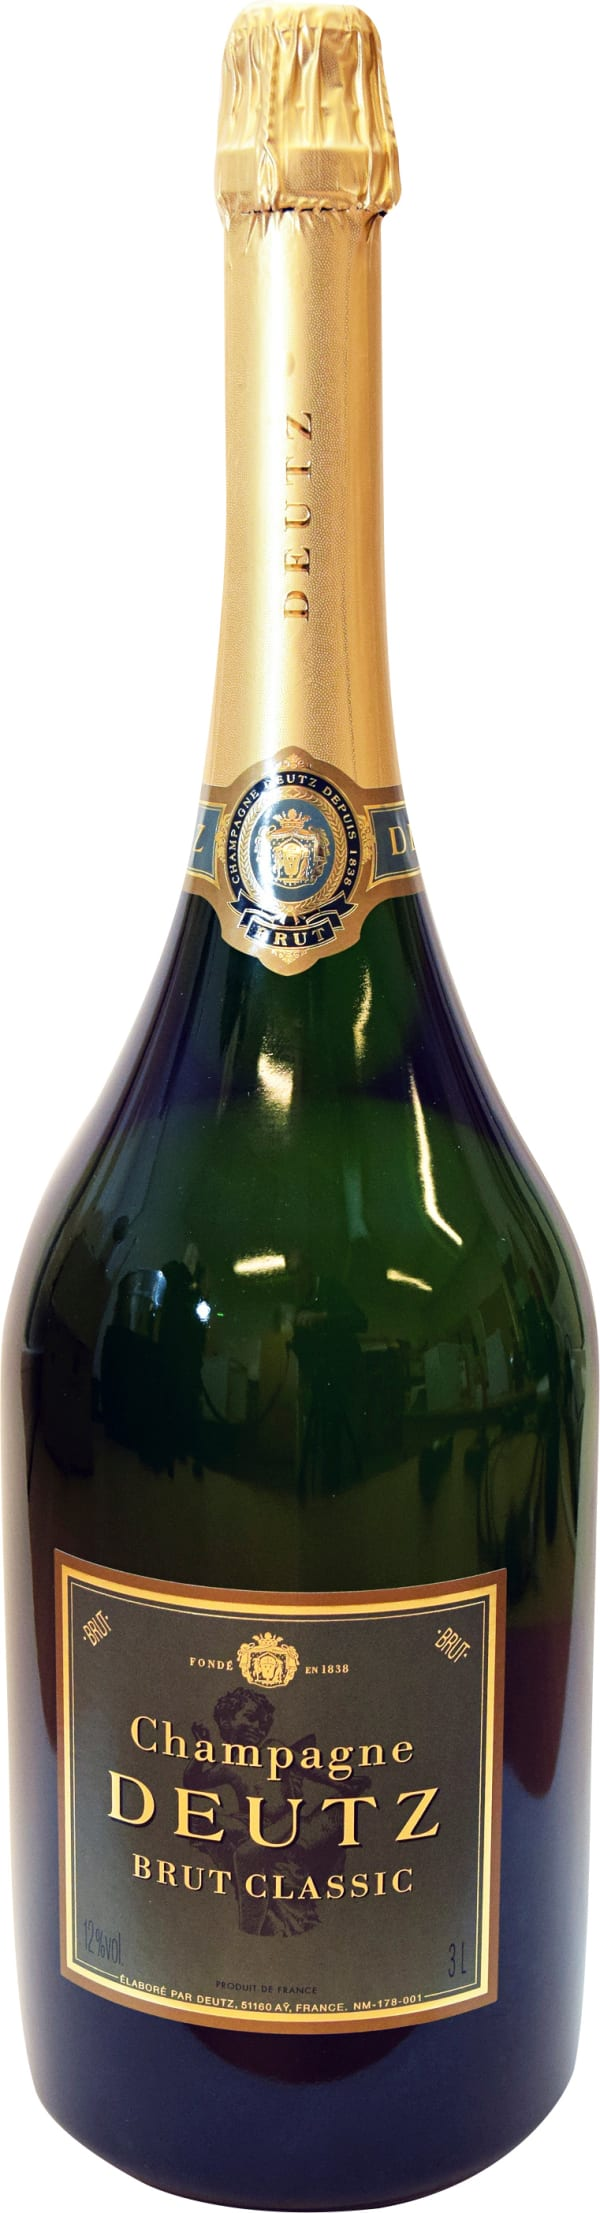 Deutz Classic Champagne Brut Jeroboam